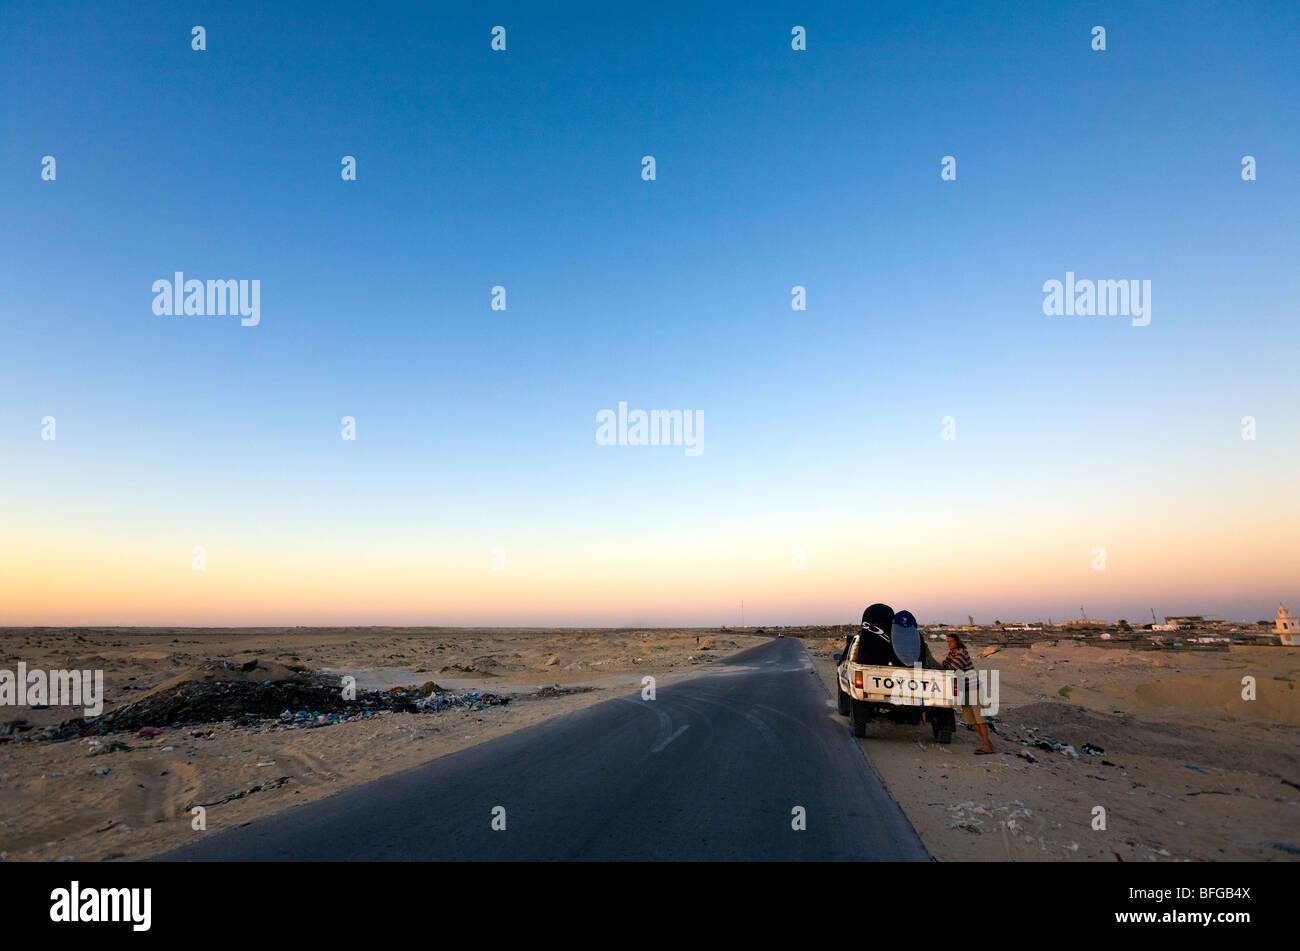 Mauritania, Ras Nouadhibou Peninsula, dusk. - Stock Image